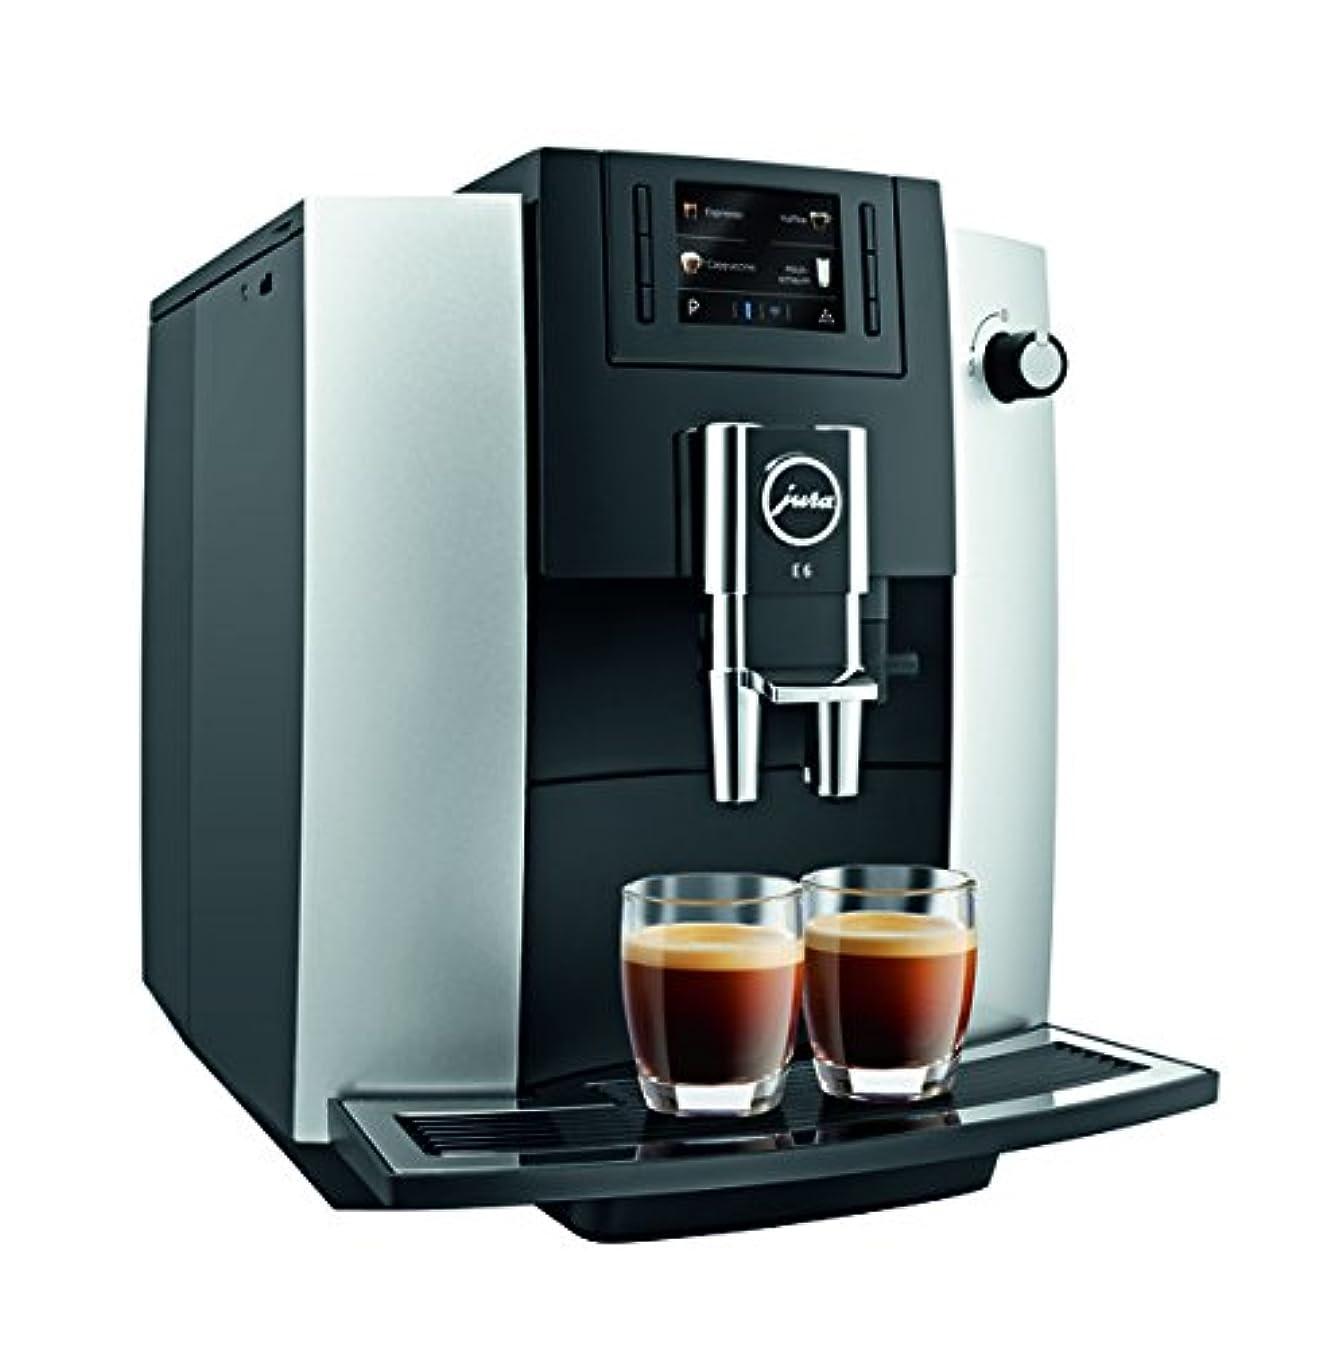 Jura 15070 E6 Automatic Coffee Center, Platinum